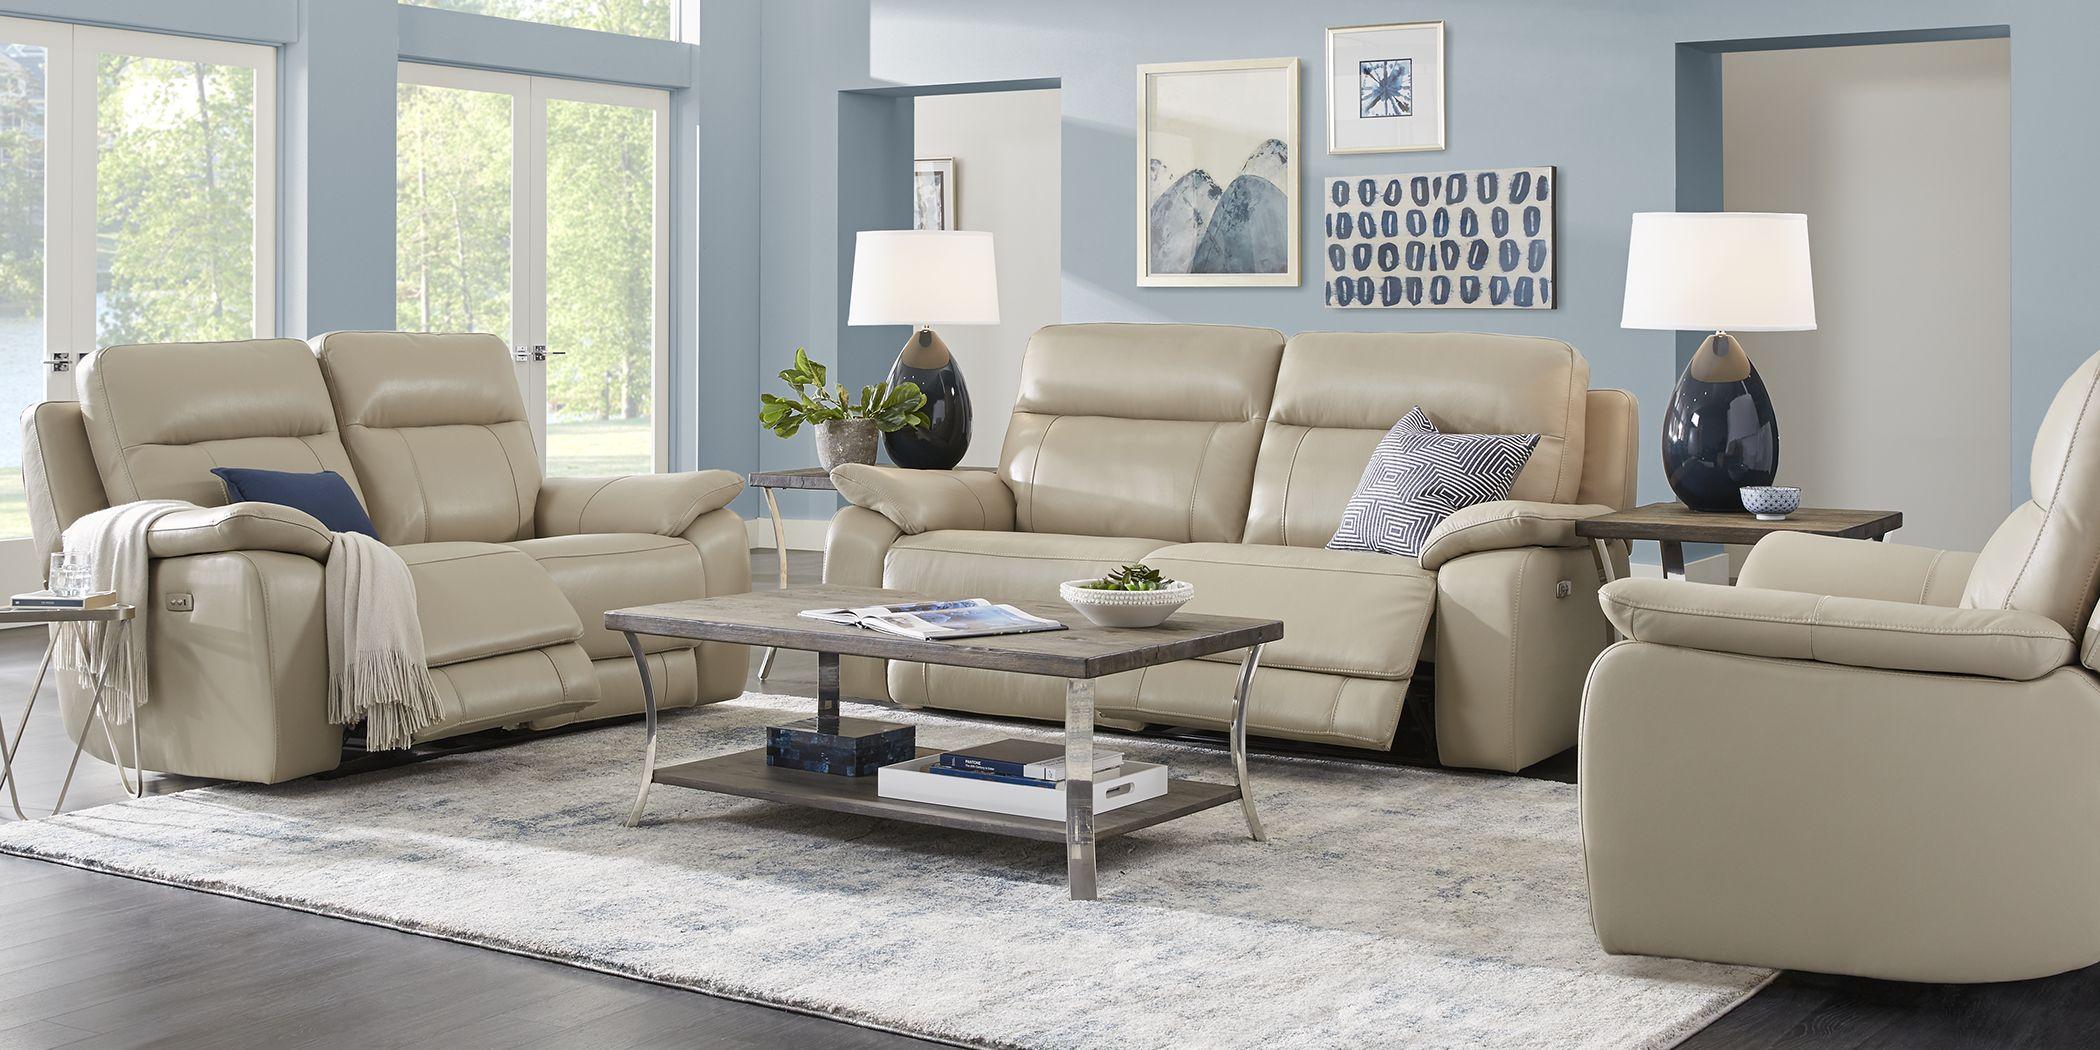 Torini Cream Leather 3 Pc Power Reclining Living Room